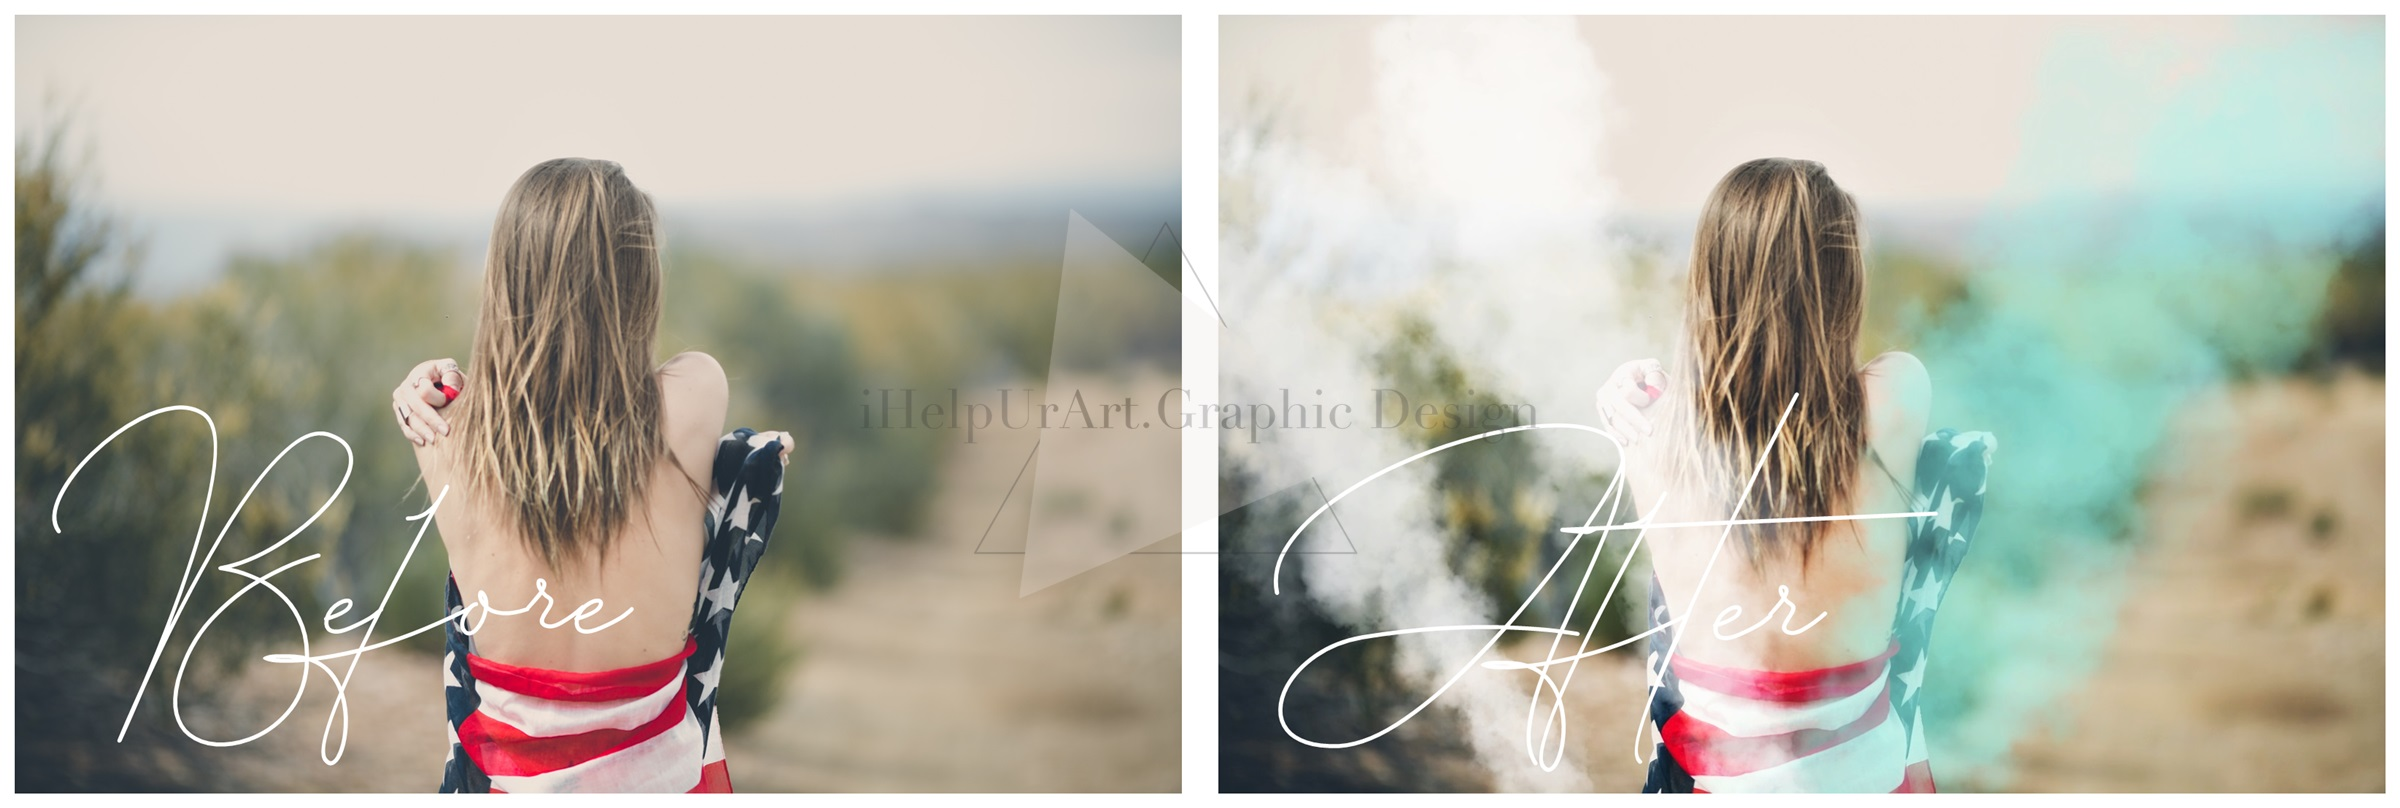 Smoke Photo Overlays - Colorful Smoke Clipart example image 2